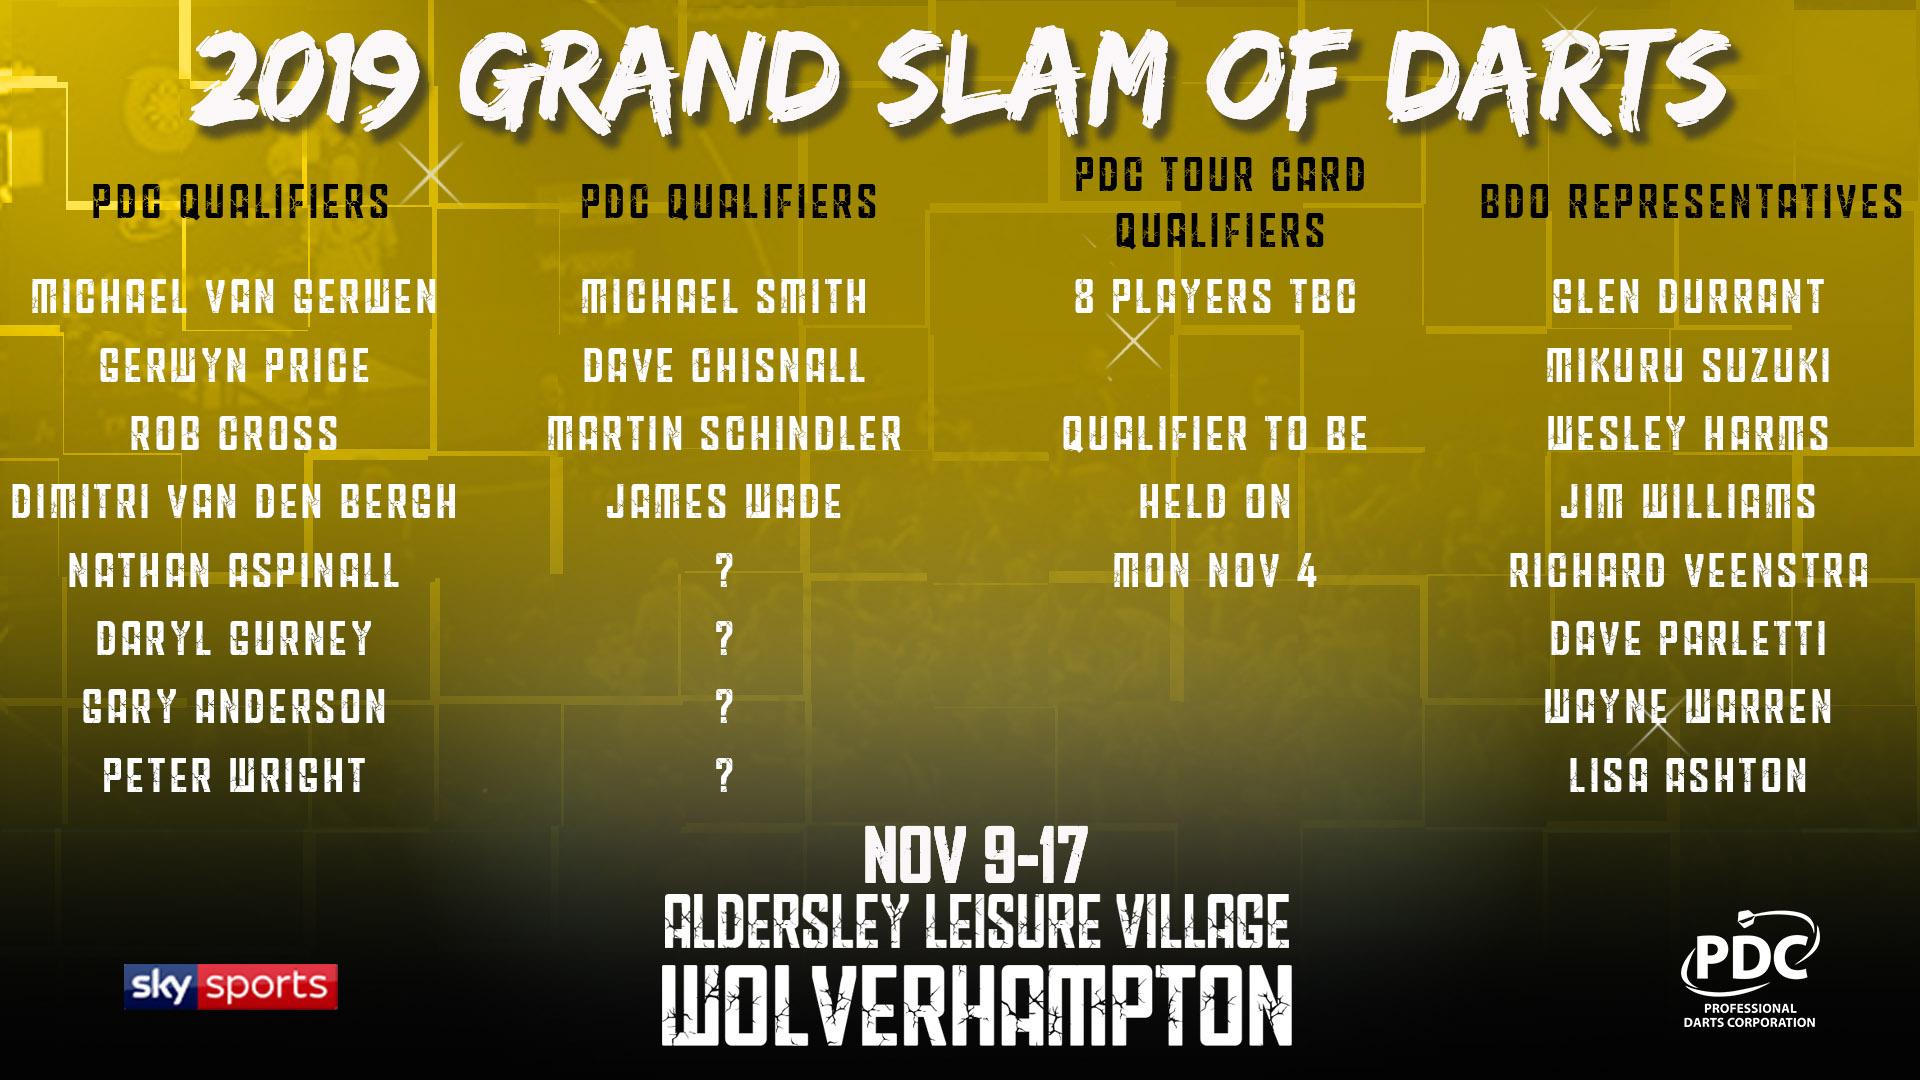 Pdc Grand Slam Of Darts 2021